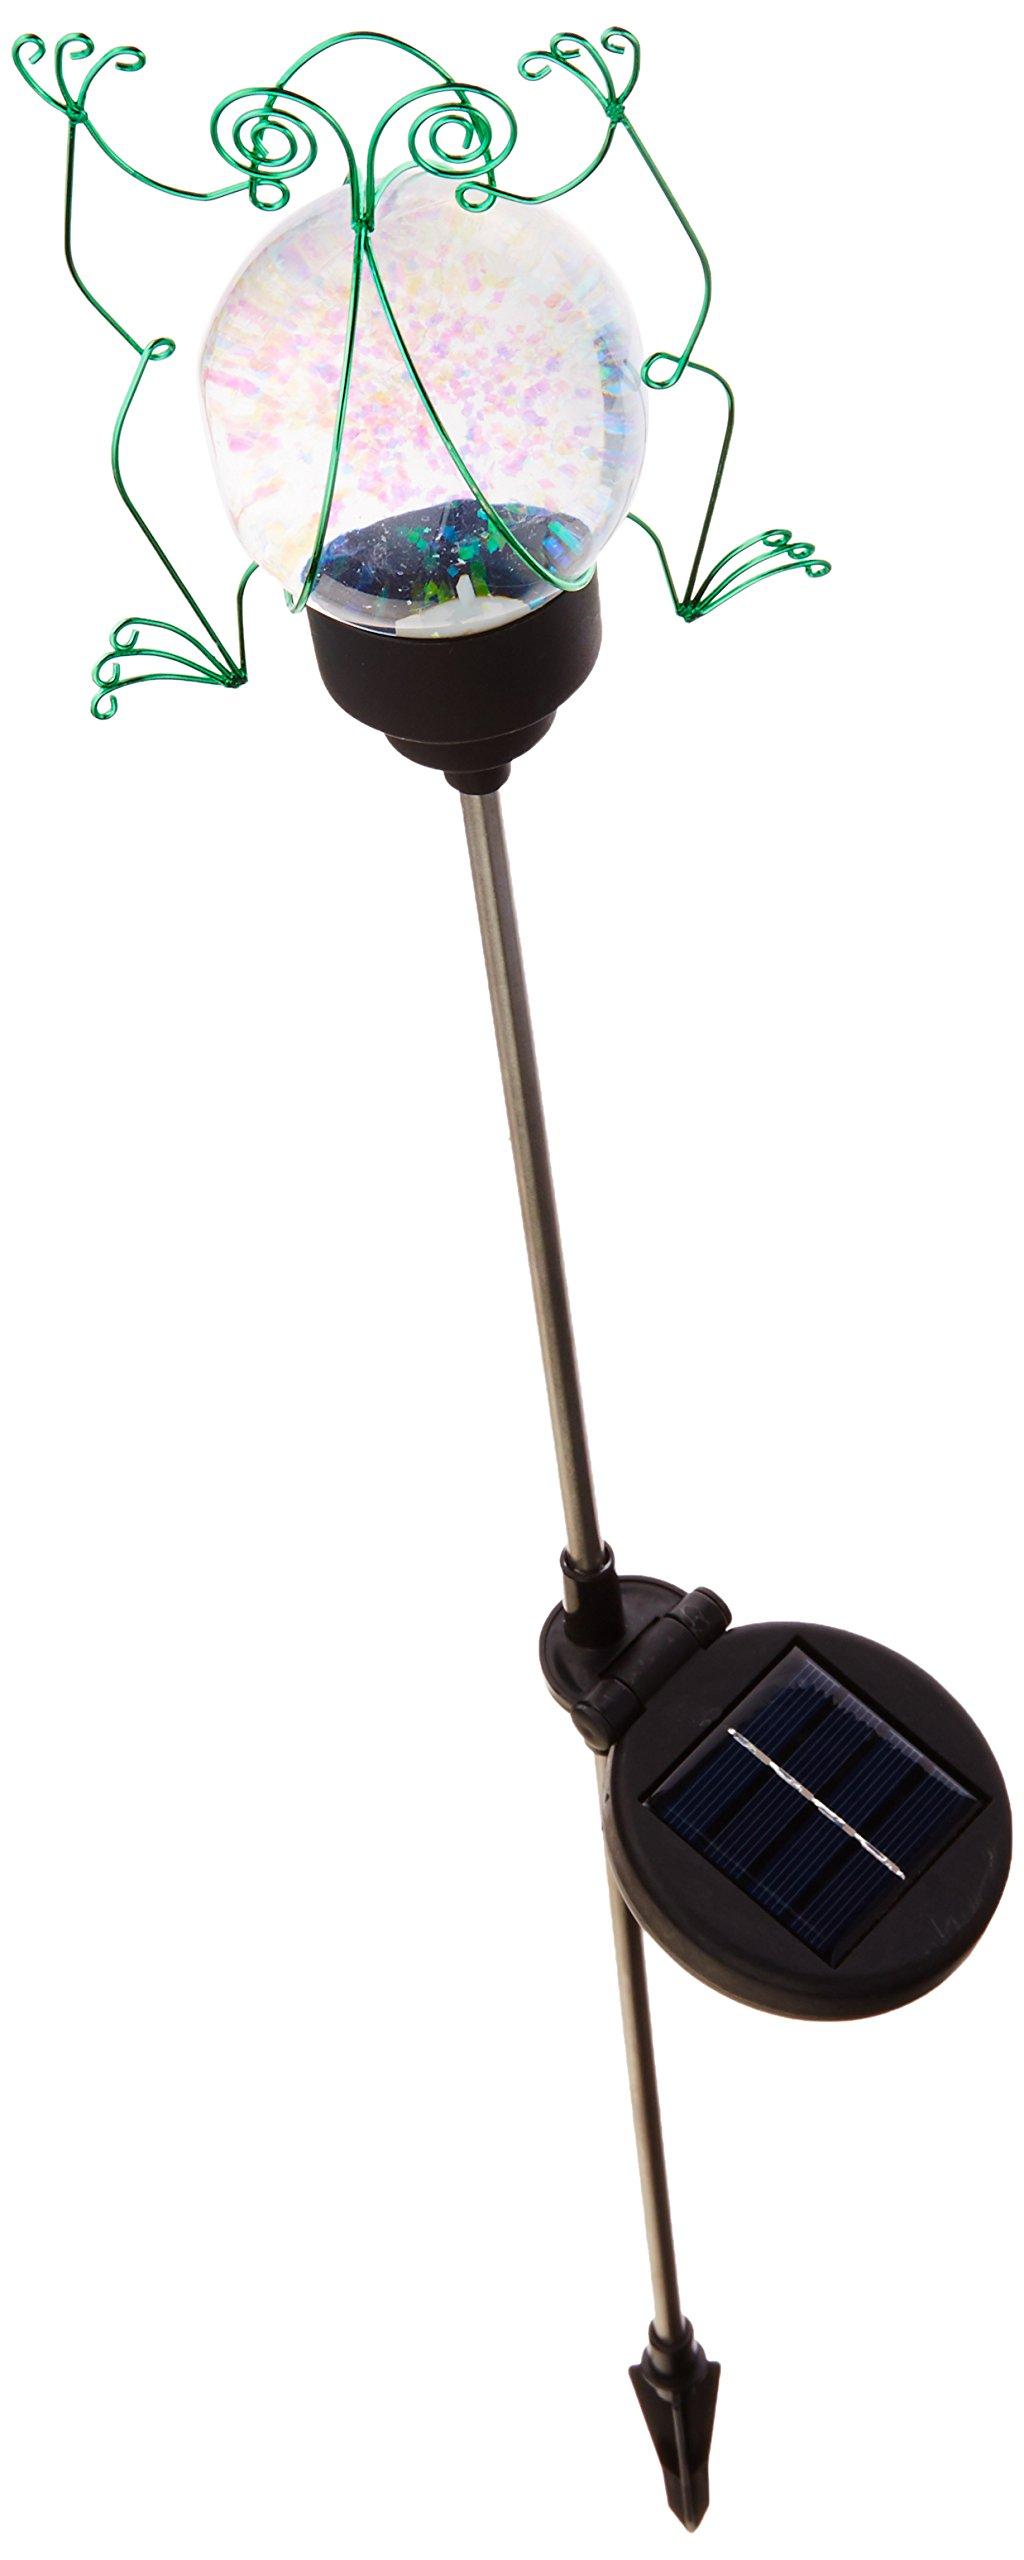 Russco III GS134509 Solar Powered Water Globe Garden Stake, Green Frog